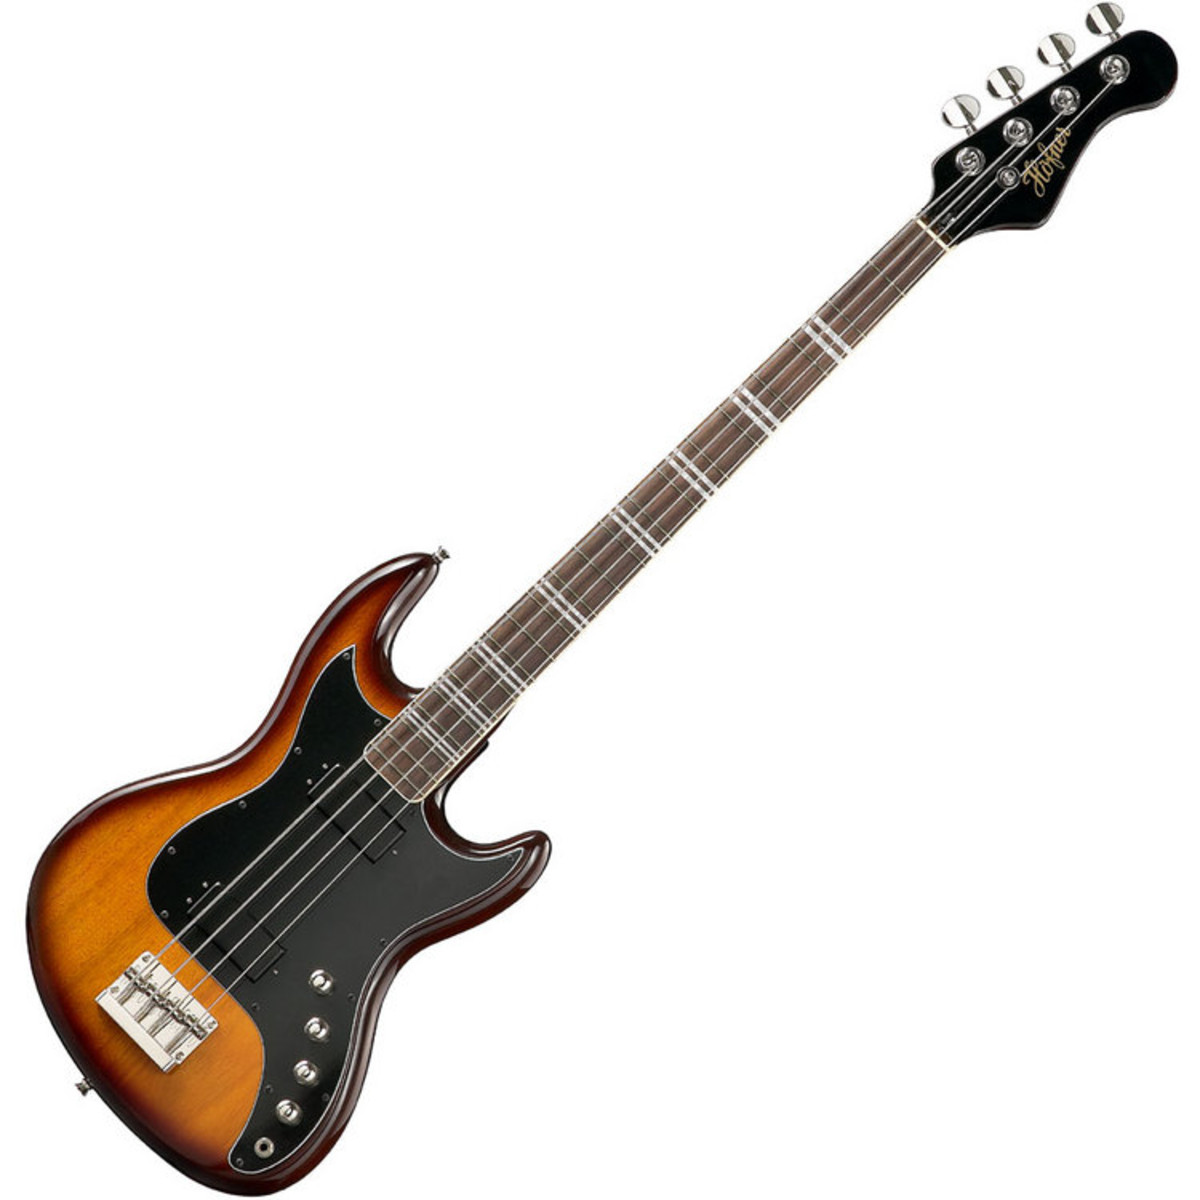 Disc Hofner Hct 185 Long Scale Bass Sunburst At Gear4music